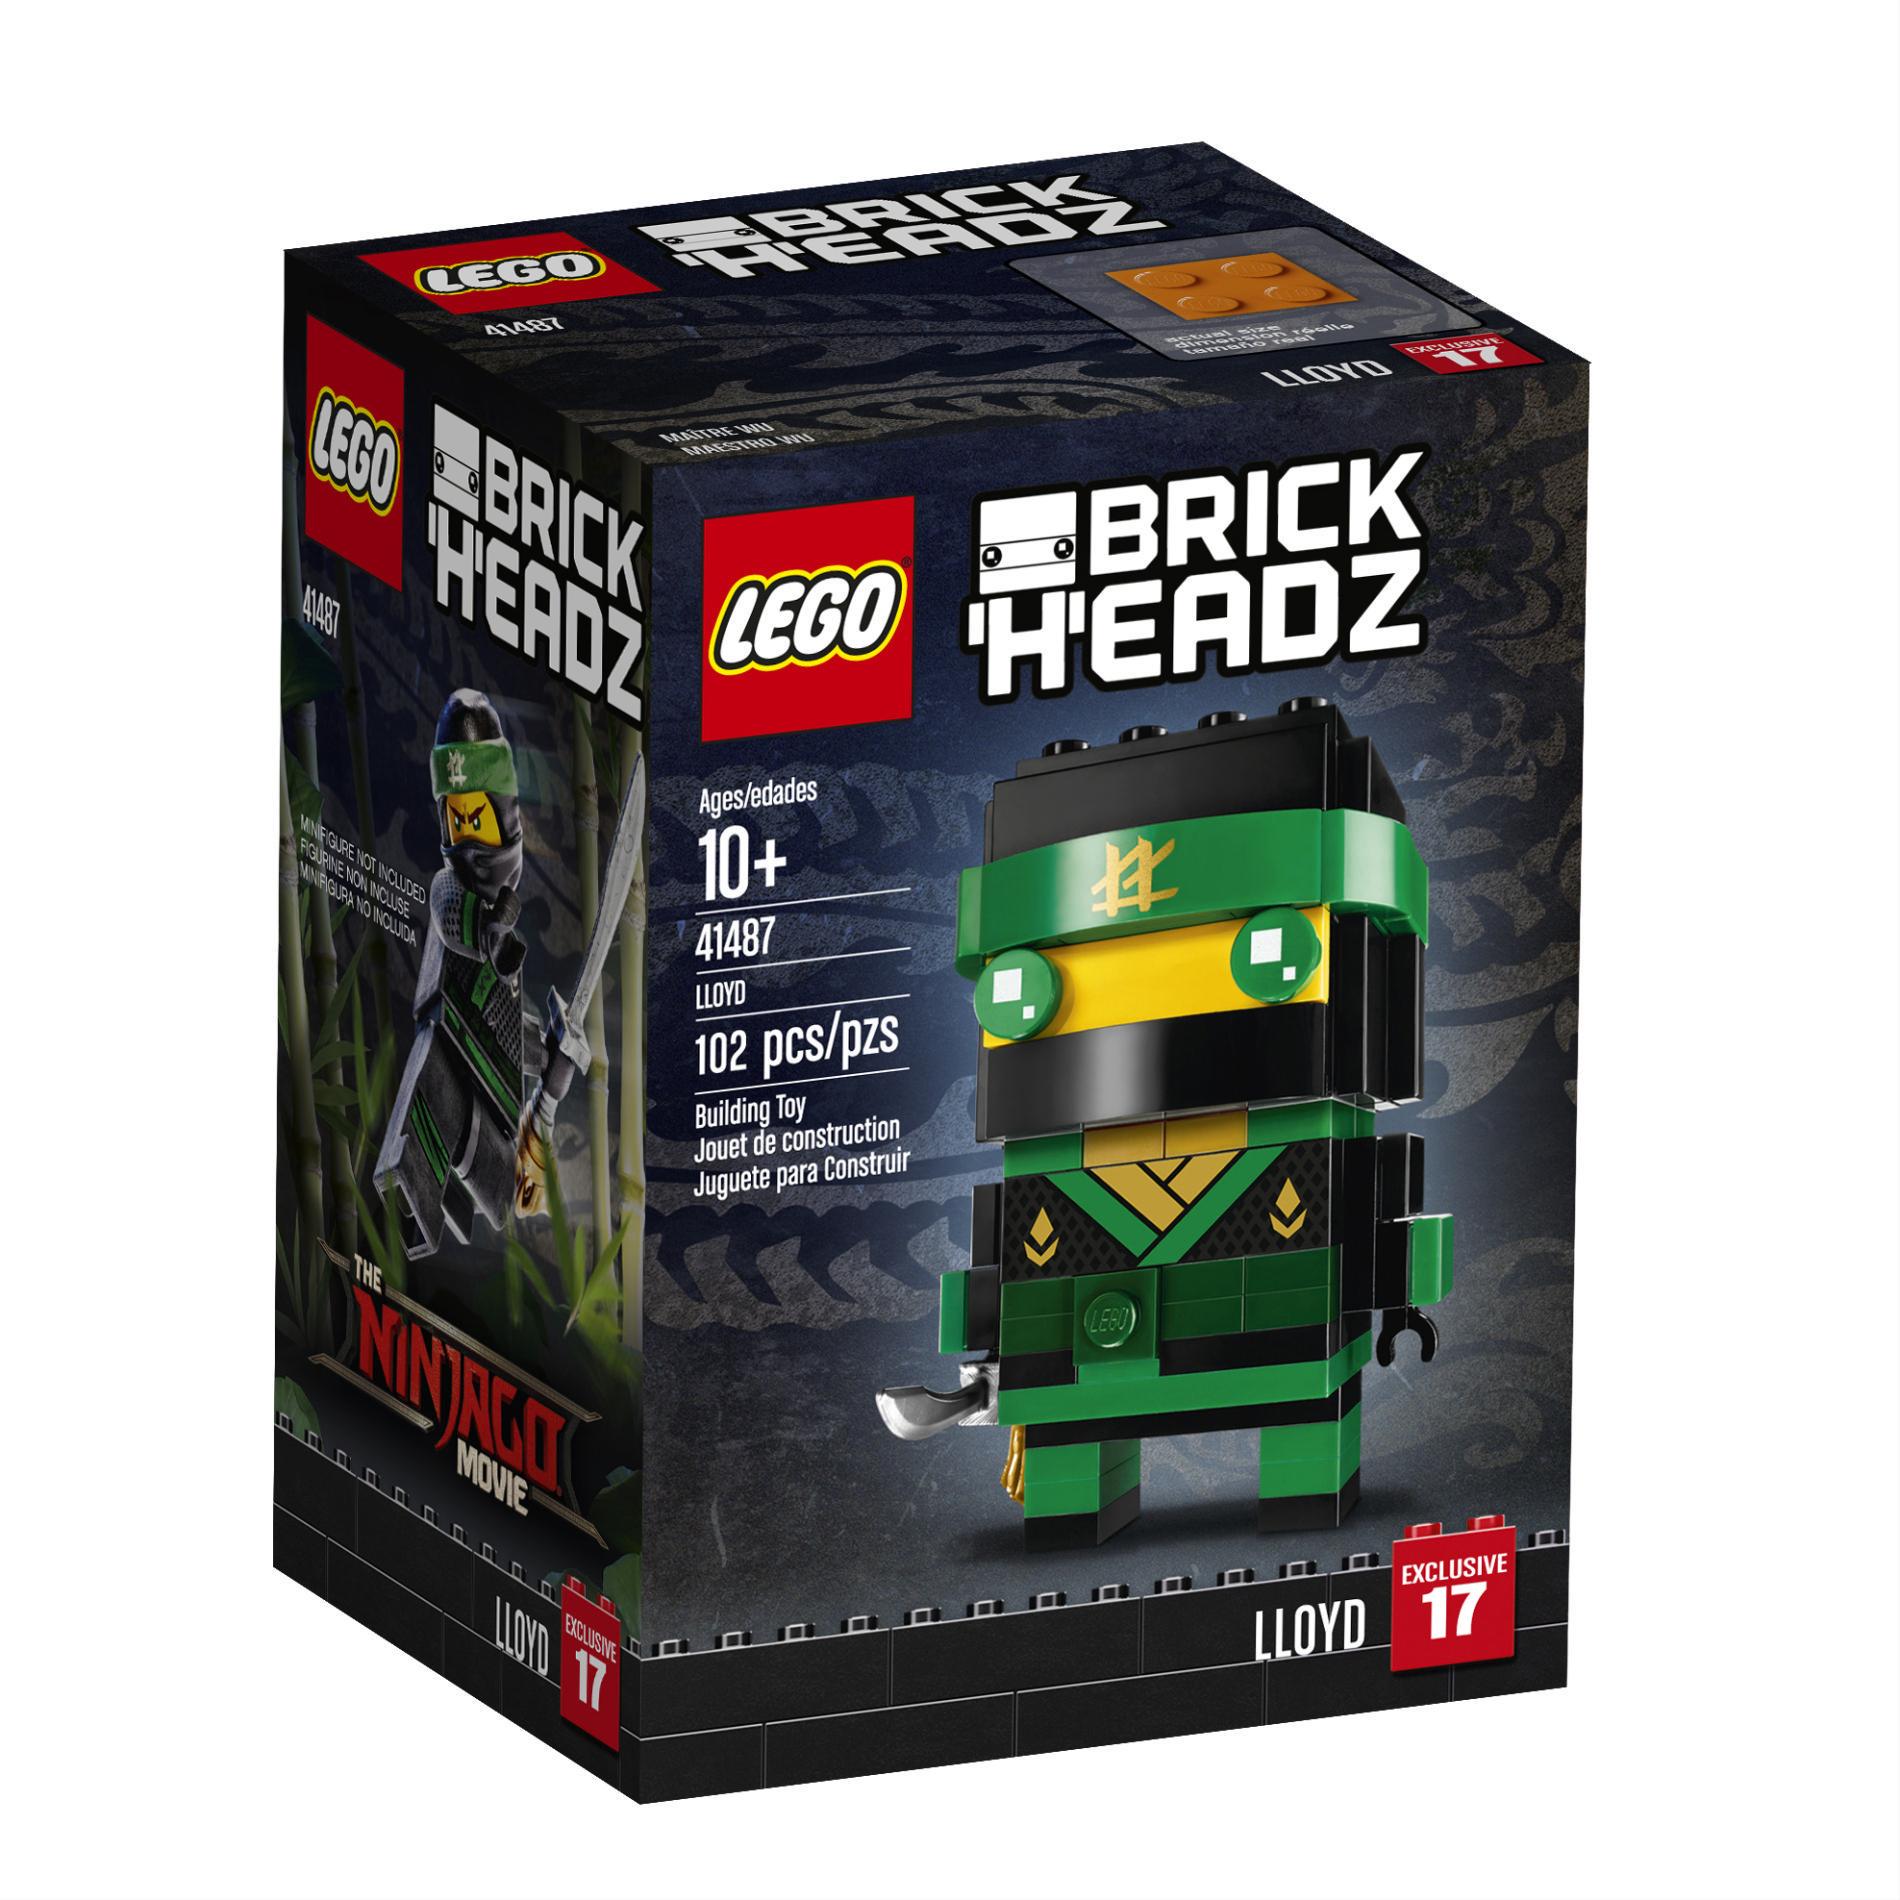 2 Lego Ninjago Movie Brickheadz Exclusive At Toys R Us Brick Brains